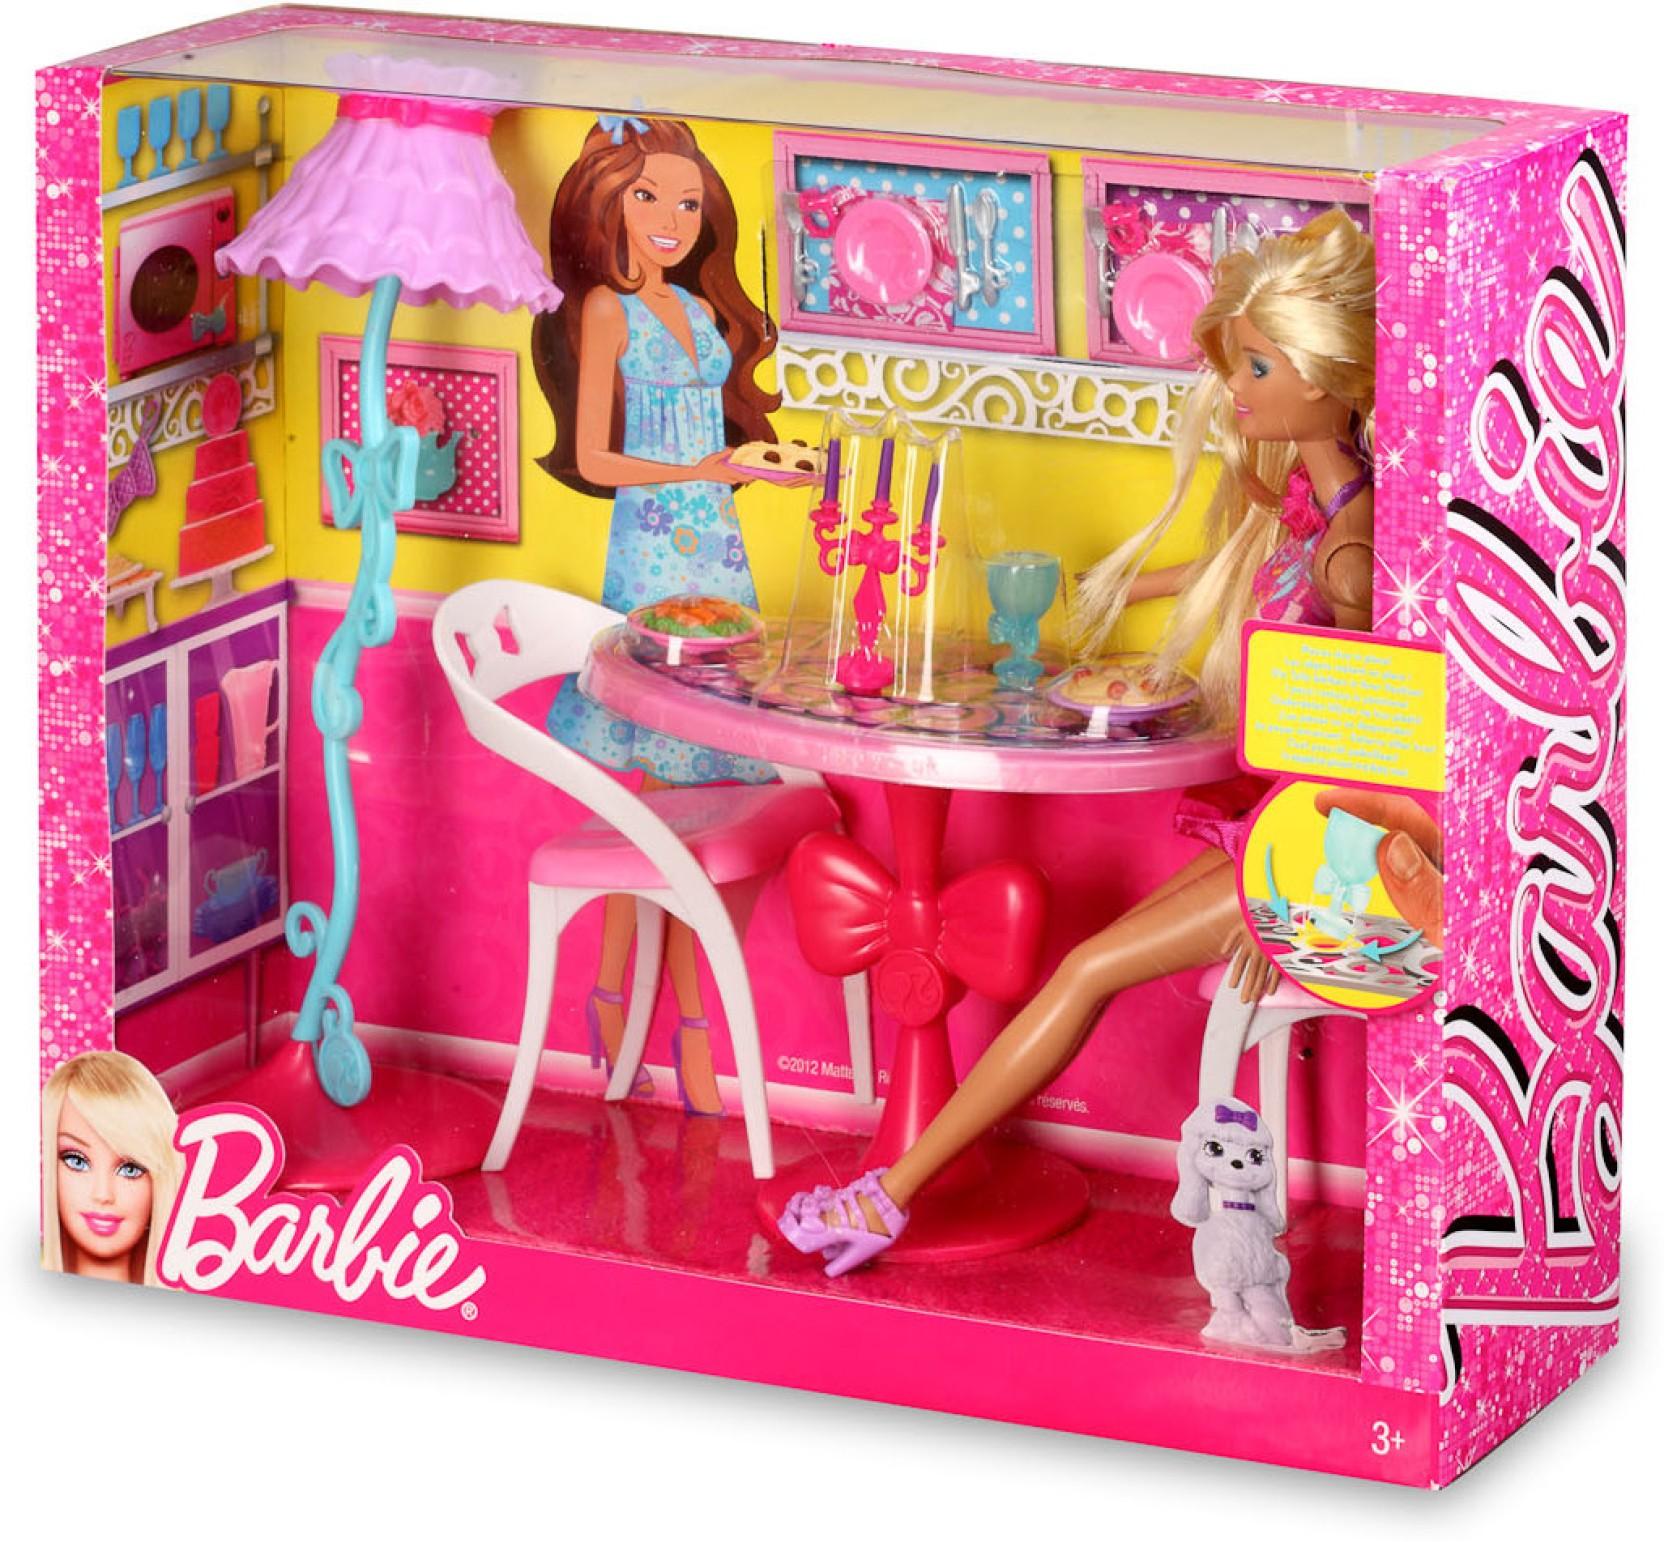 Articulating Lamp Parts Mattel Barbie Glam Dining Room Furniture and Doll Set - X7942 - Barbie ...